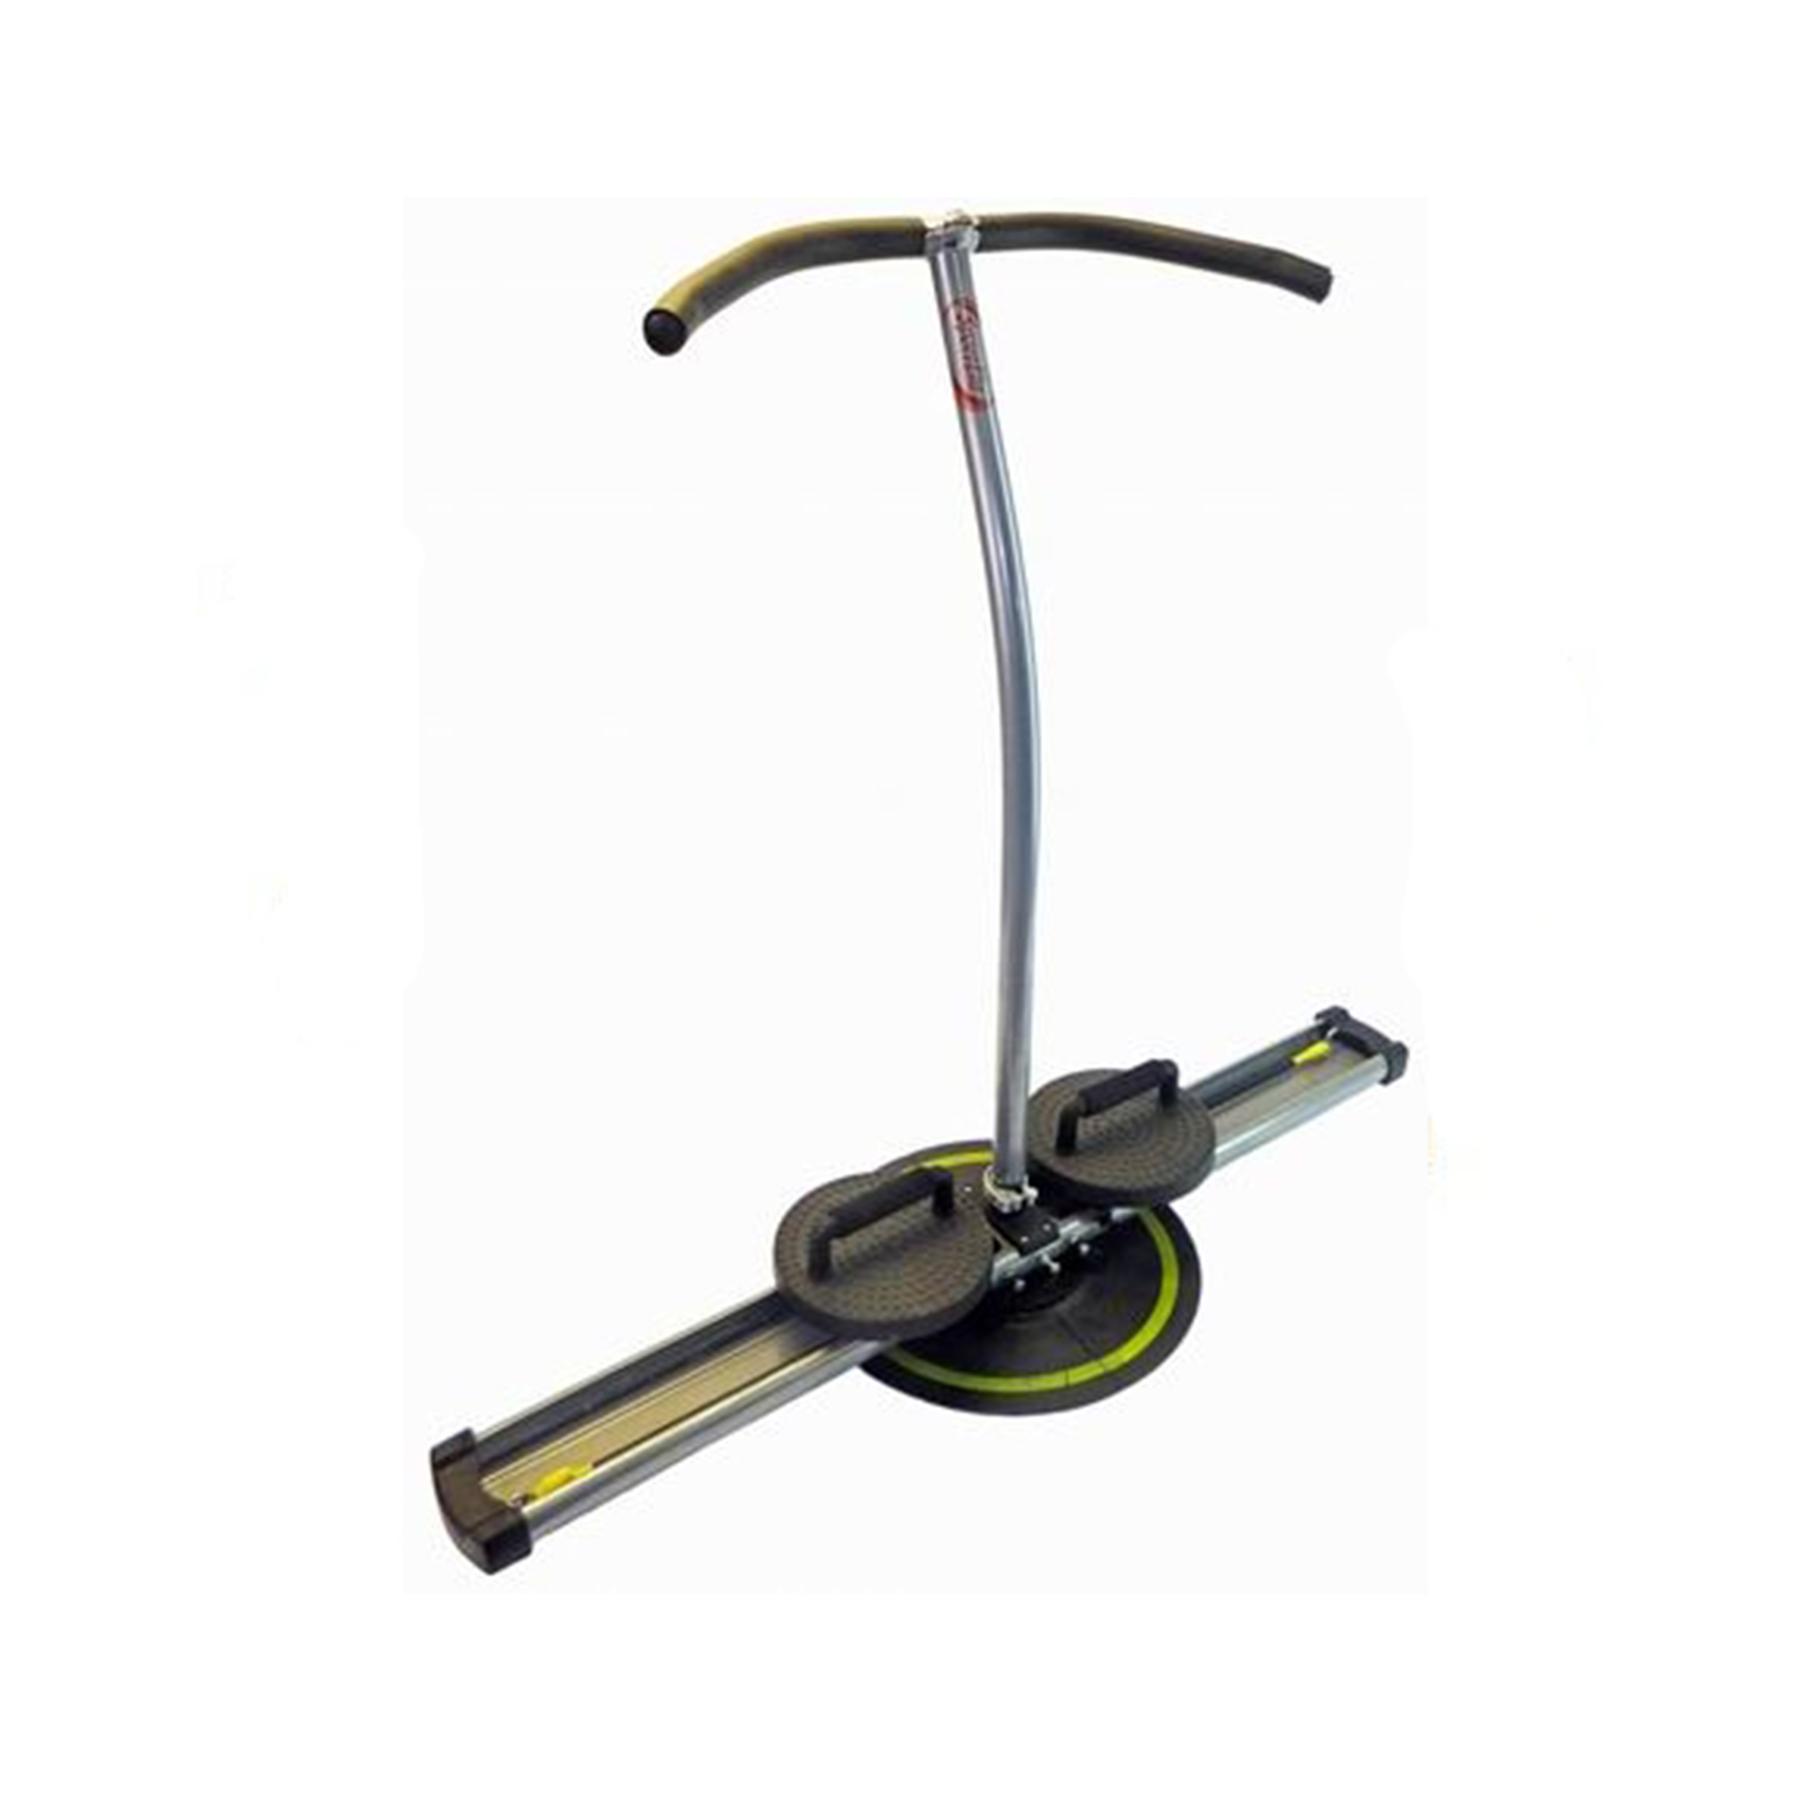 Тренажер для мышц Circle Glide SE-9104 (усоверш. Leg Magic) АКЦИЯ!